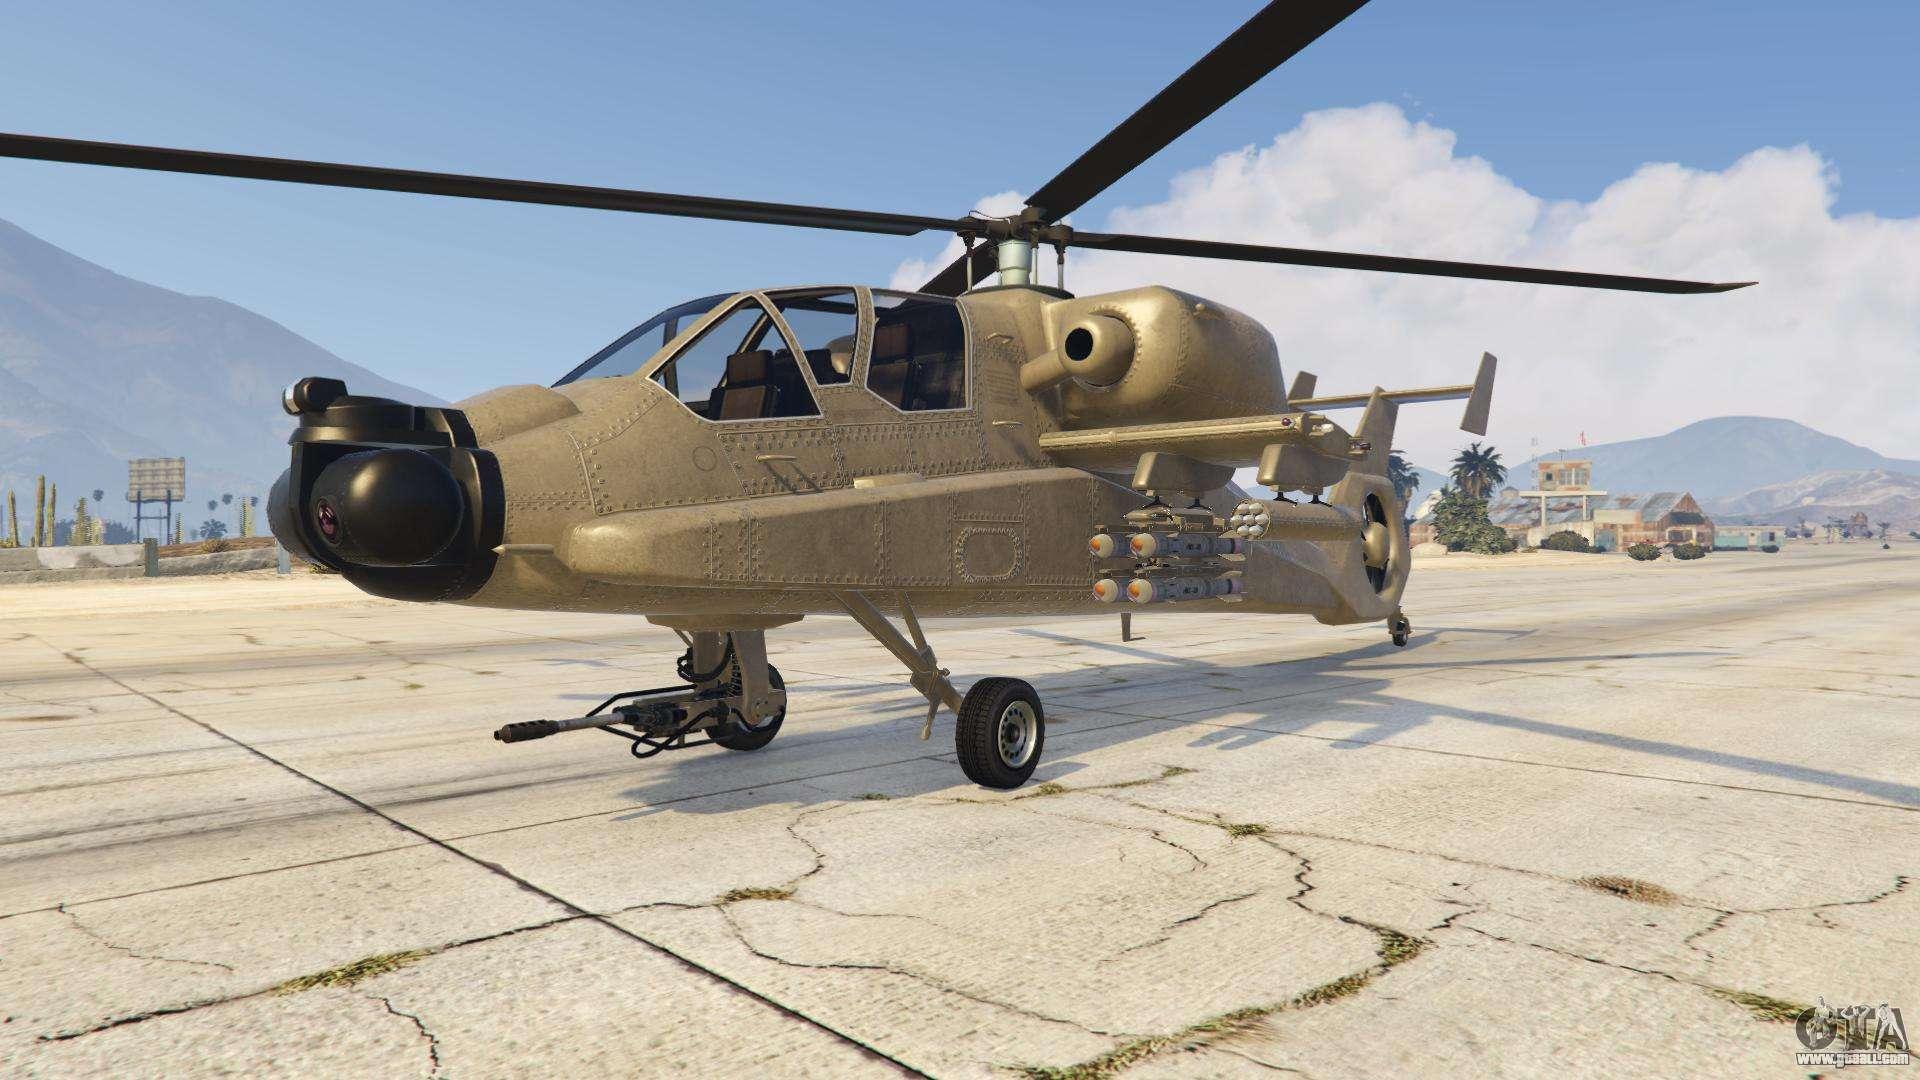 FH-1 Hunter from GTA Online